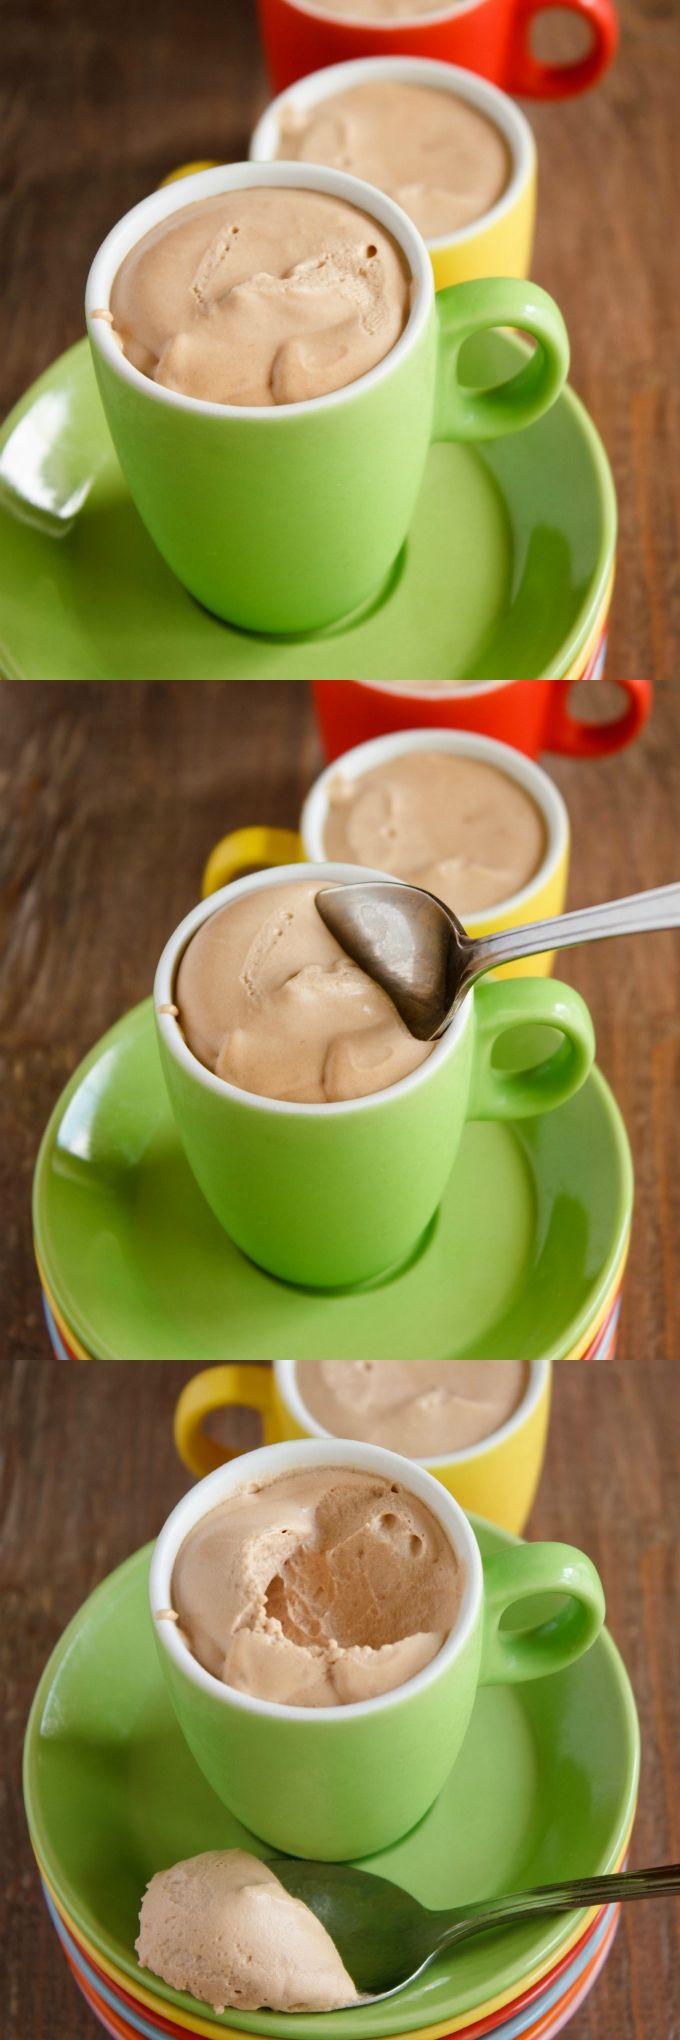 Top 25+ best Lindt chocolate truffles ideas on Pinterest | Lindt ...